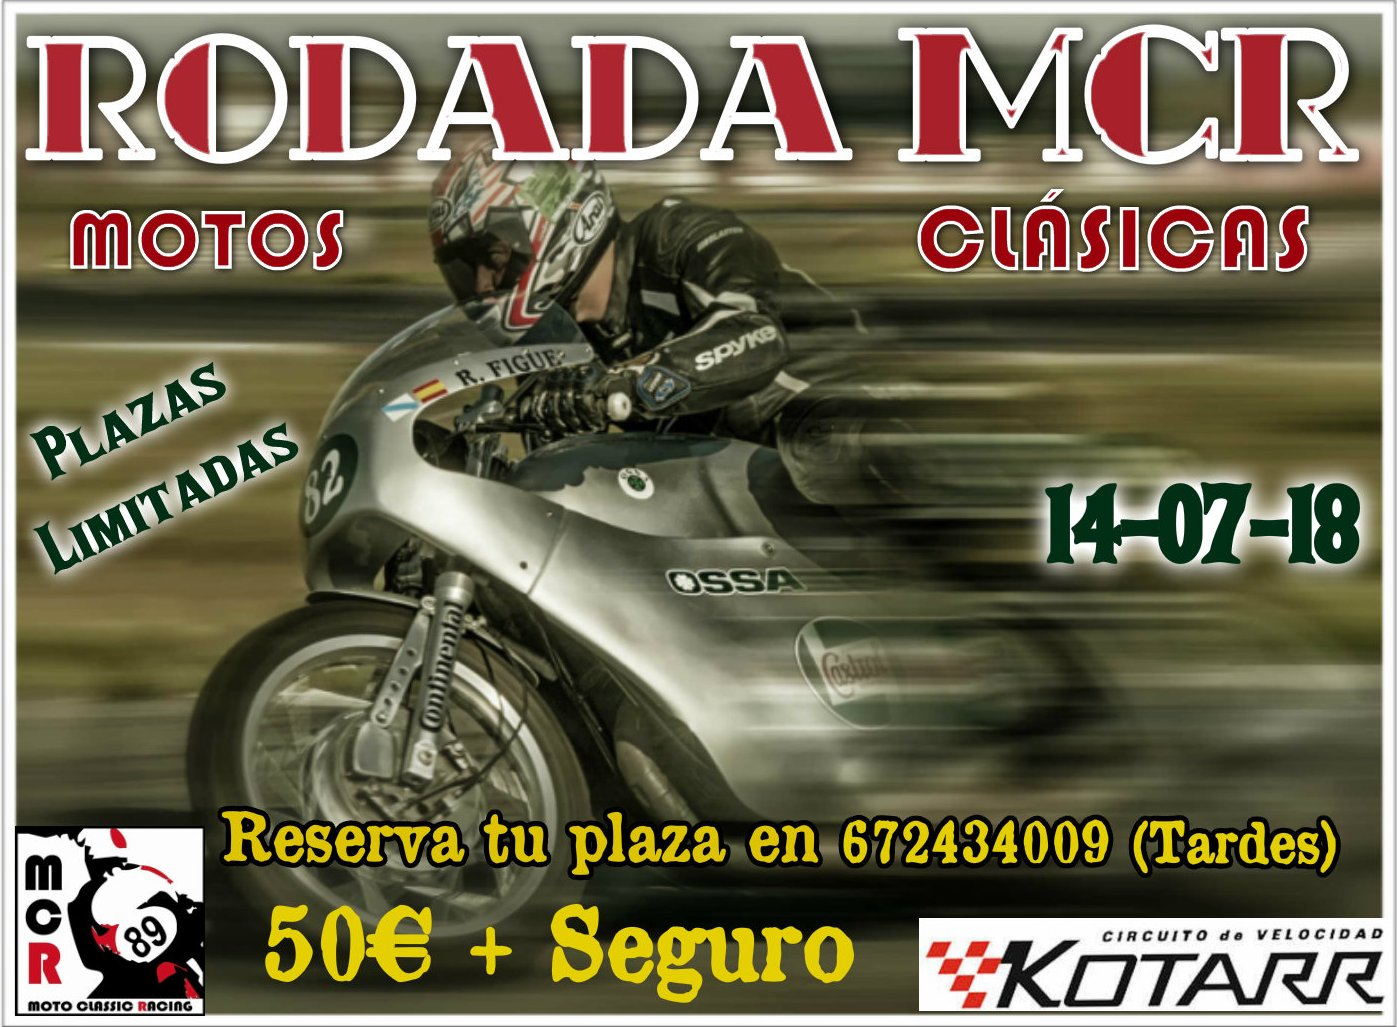 Circuito Fk1 : Rodada mcr 14 07 18 circuito kotarr